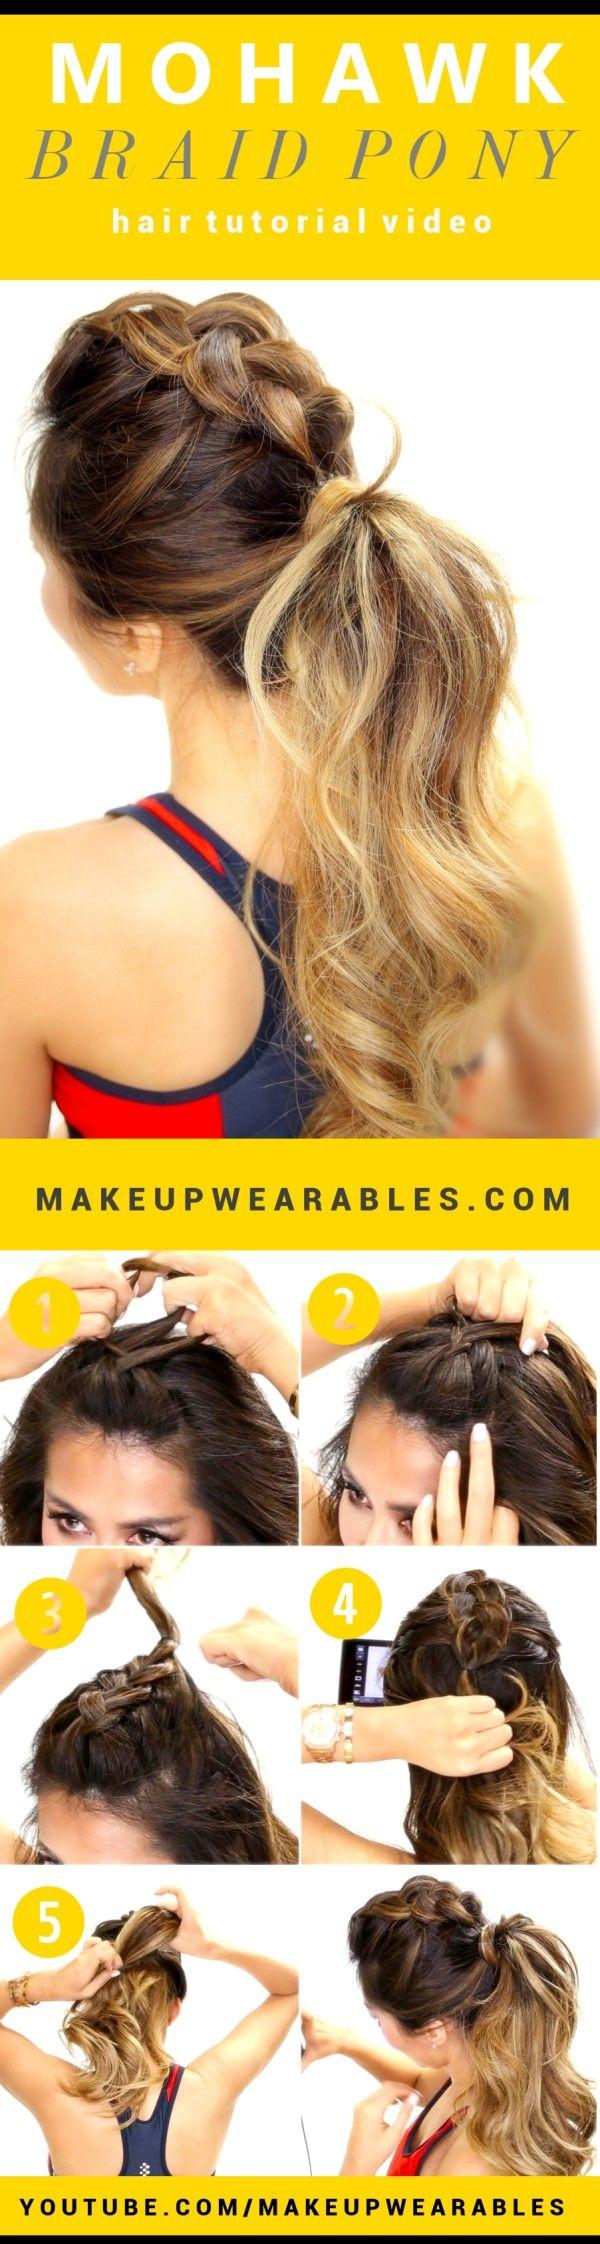 15 Spectacular Diy Hairstyle Ideas Grape Of The Ego Hair Styles Long Hair Styles Mohawk Braid